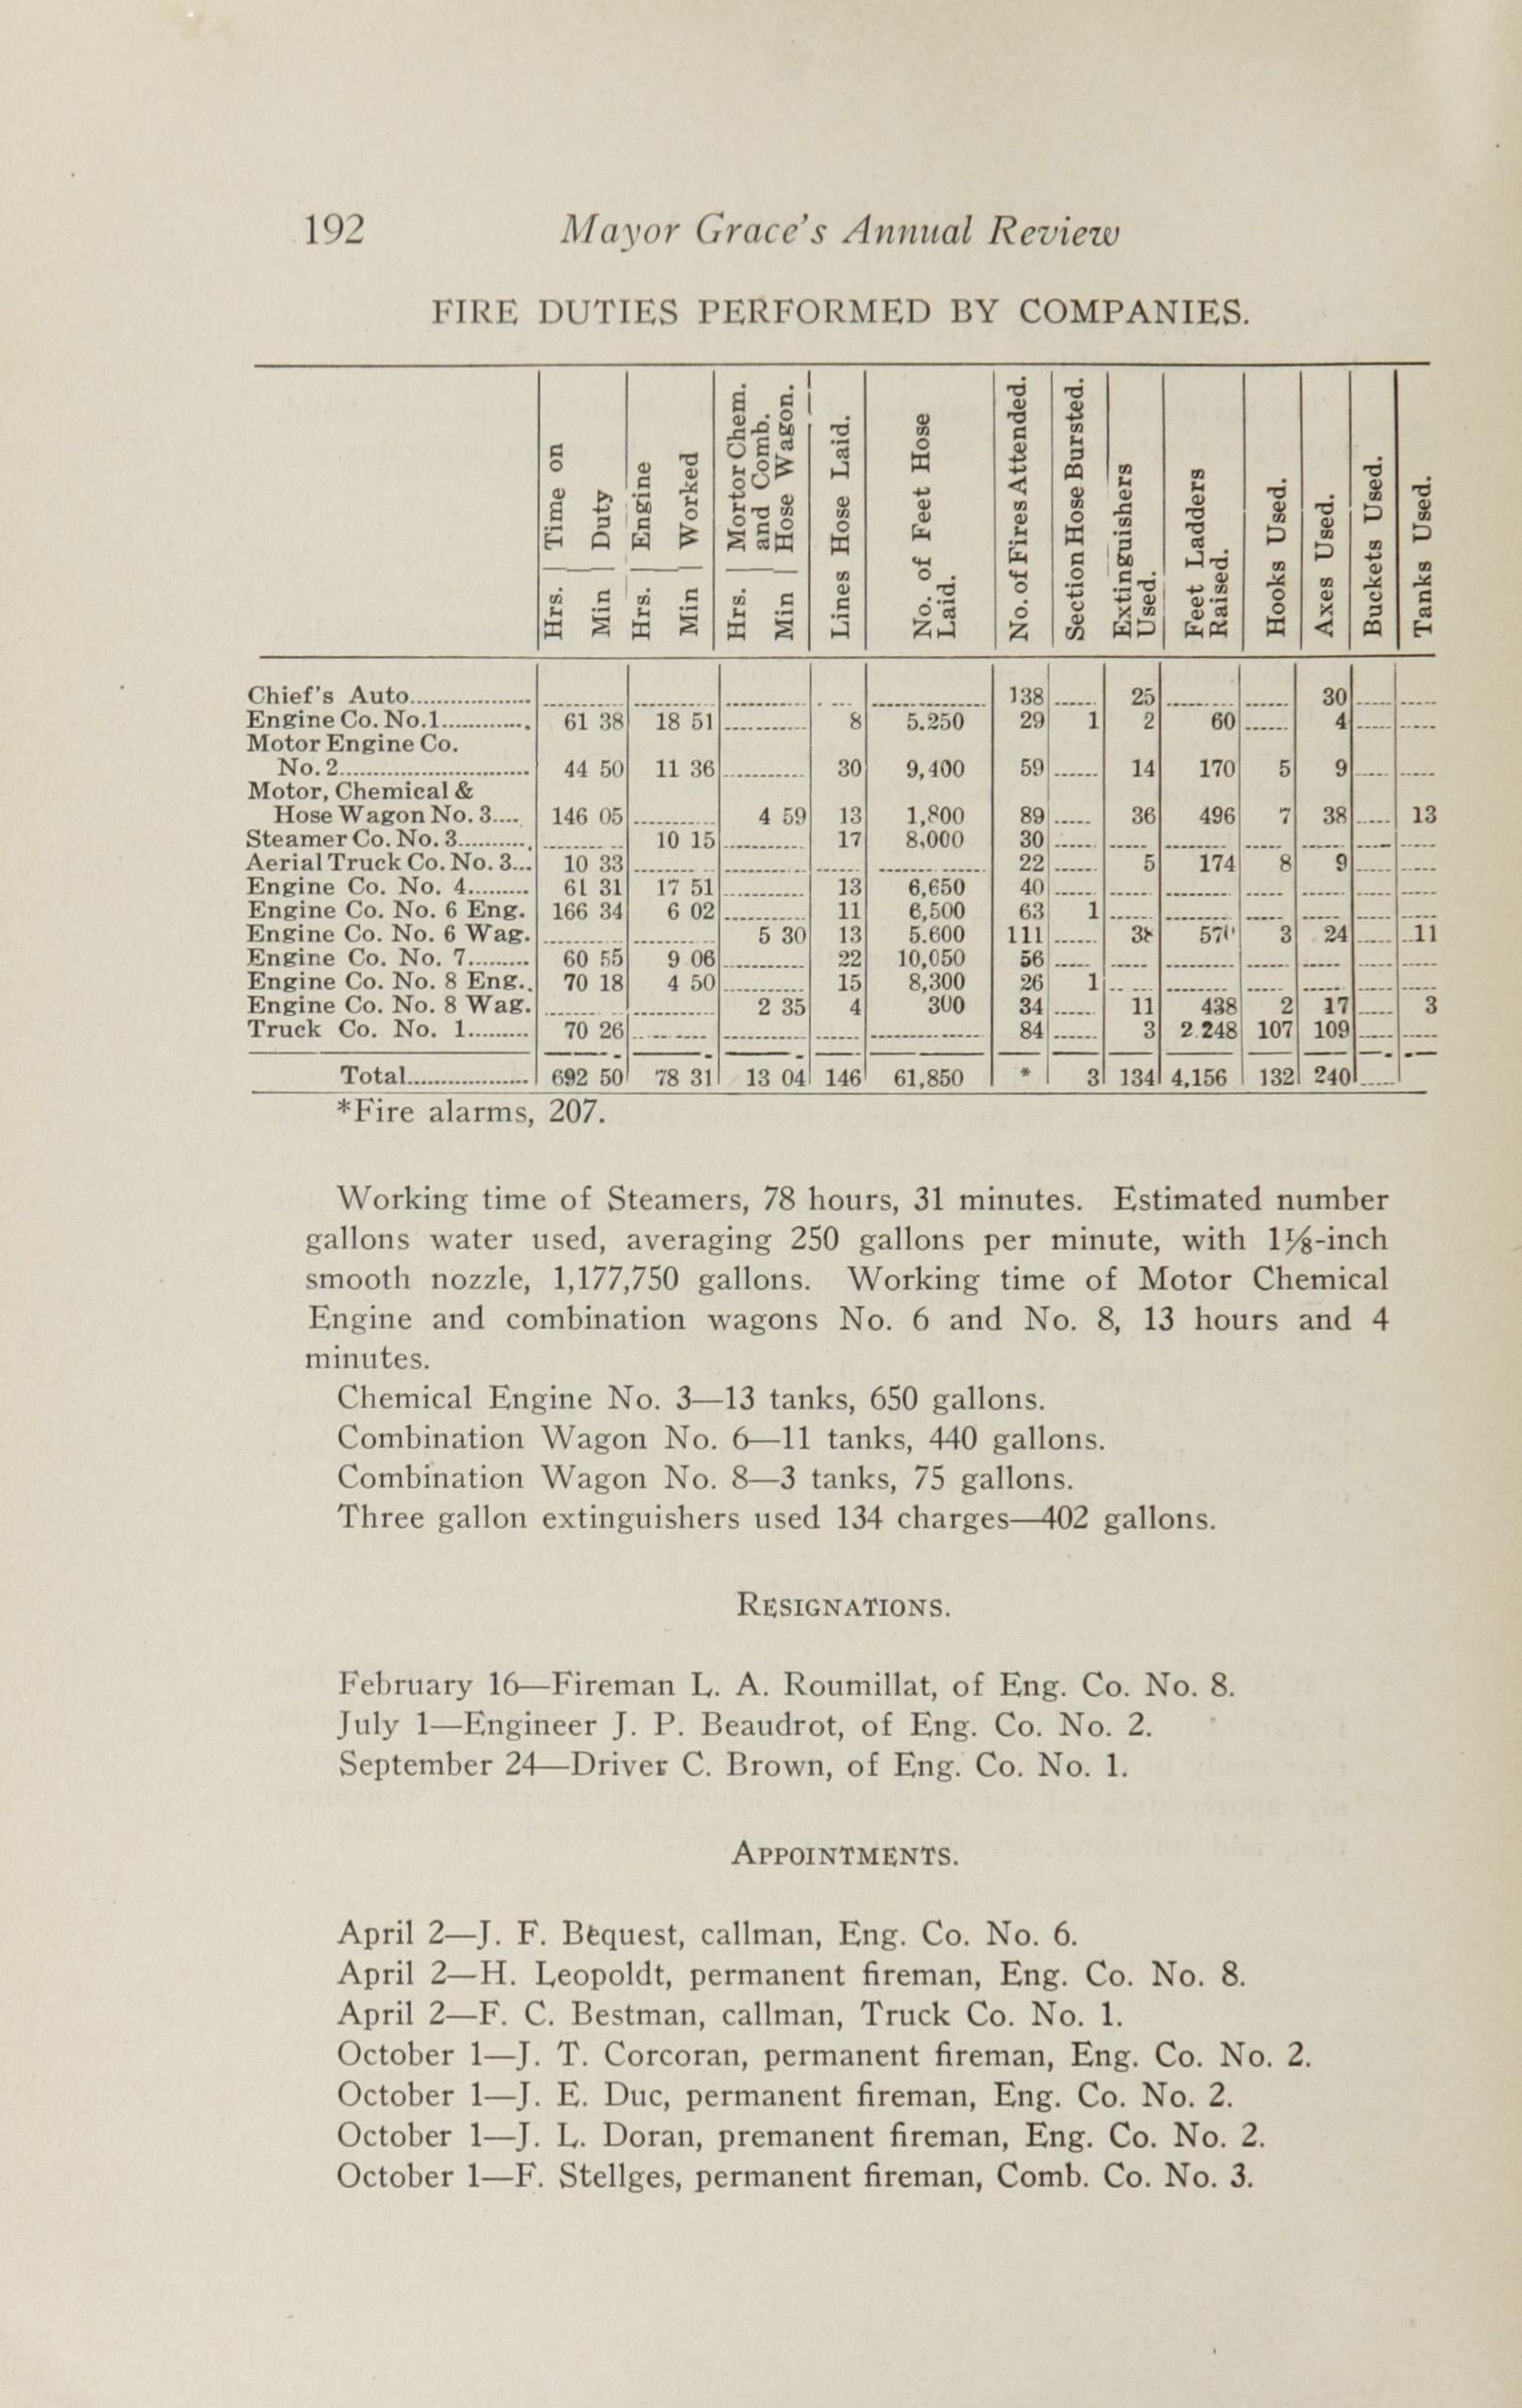 Charleston Yearbook, 1913, page 192